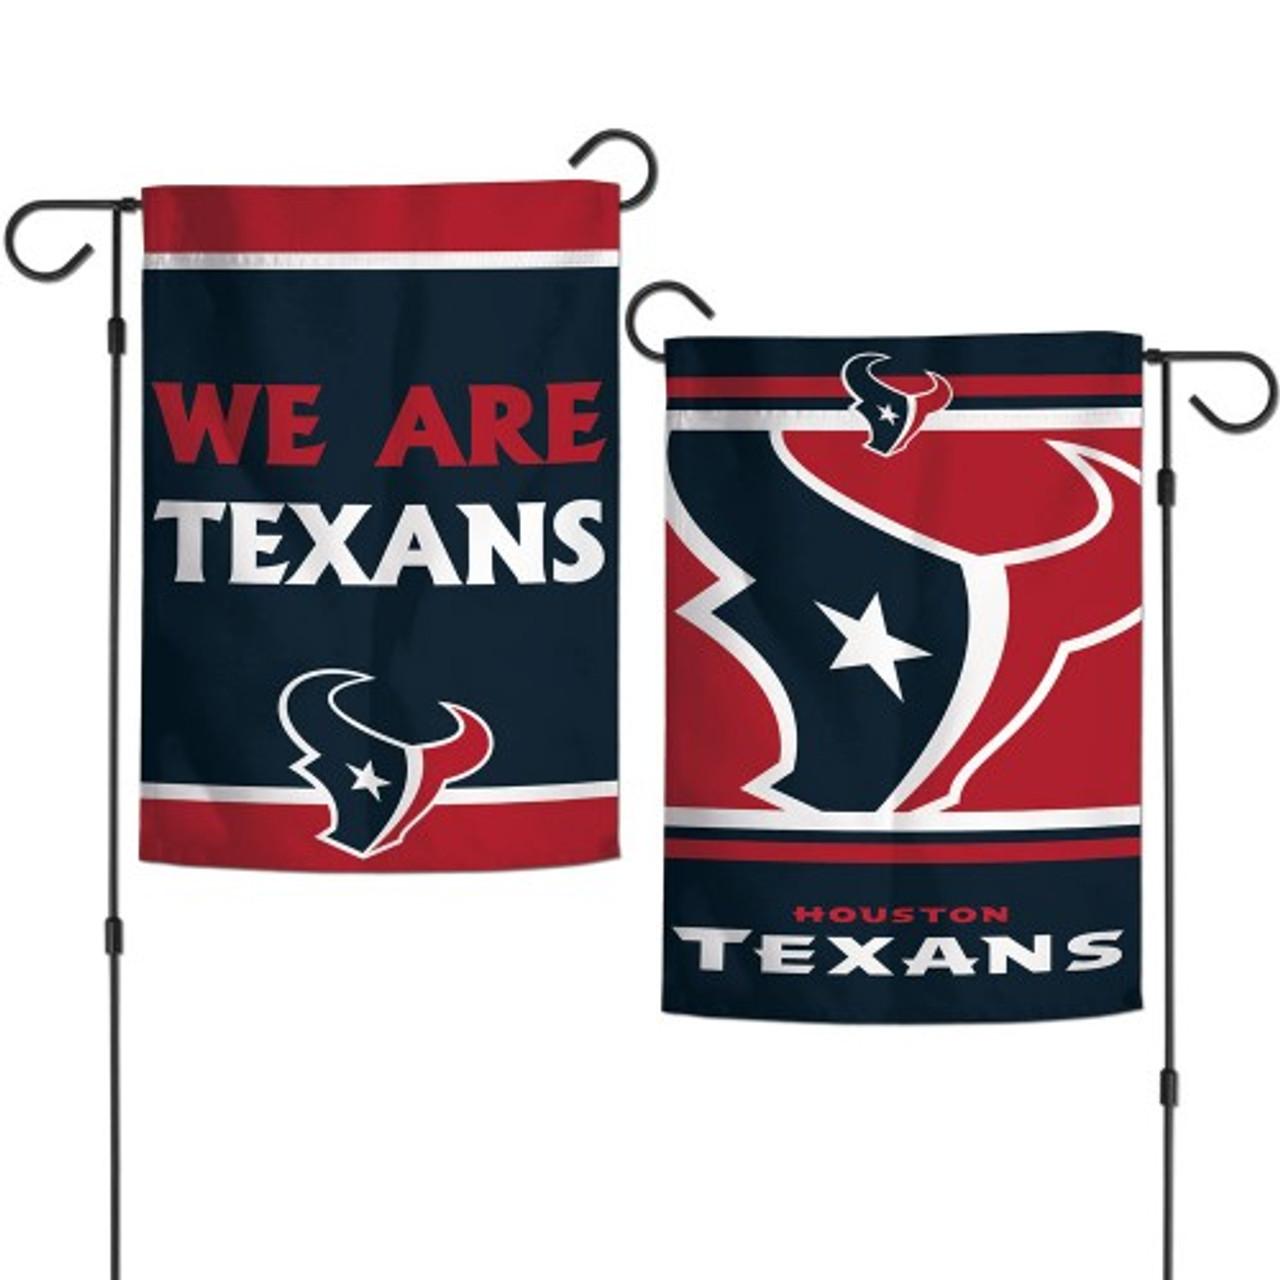 Houston Texans Flag 12x18 Garden Style 2 Sided Slogan Design - Special Order